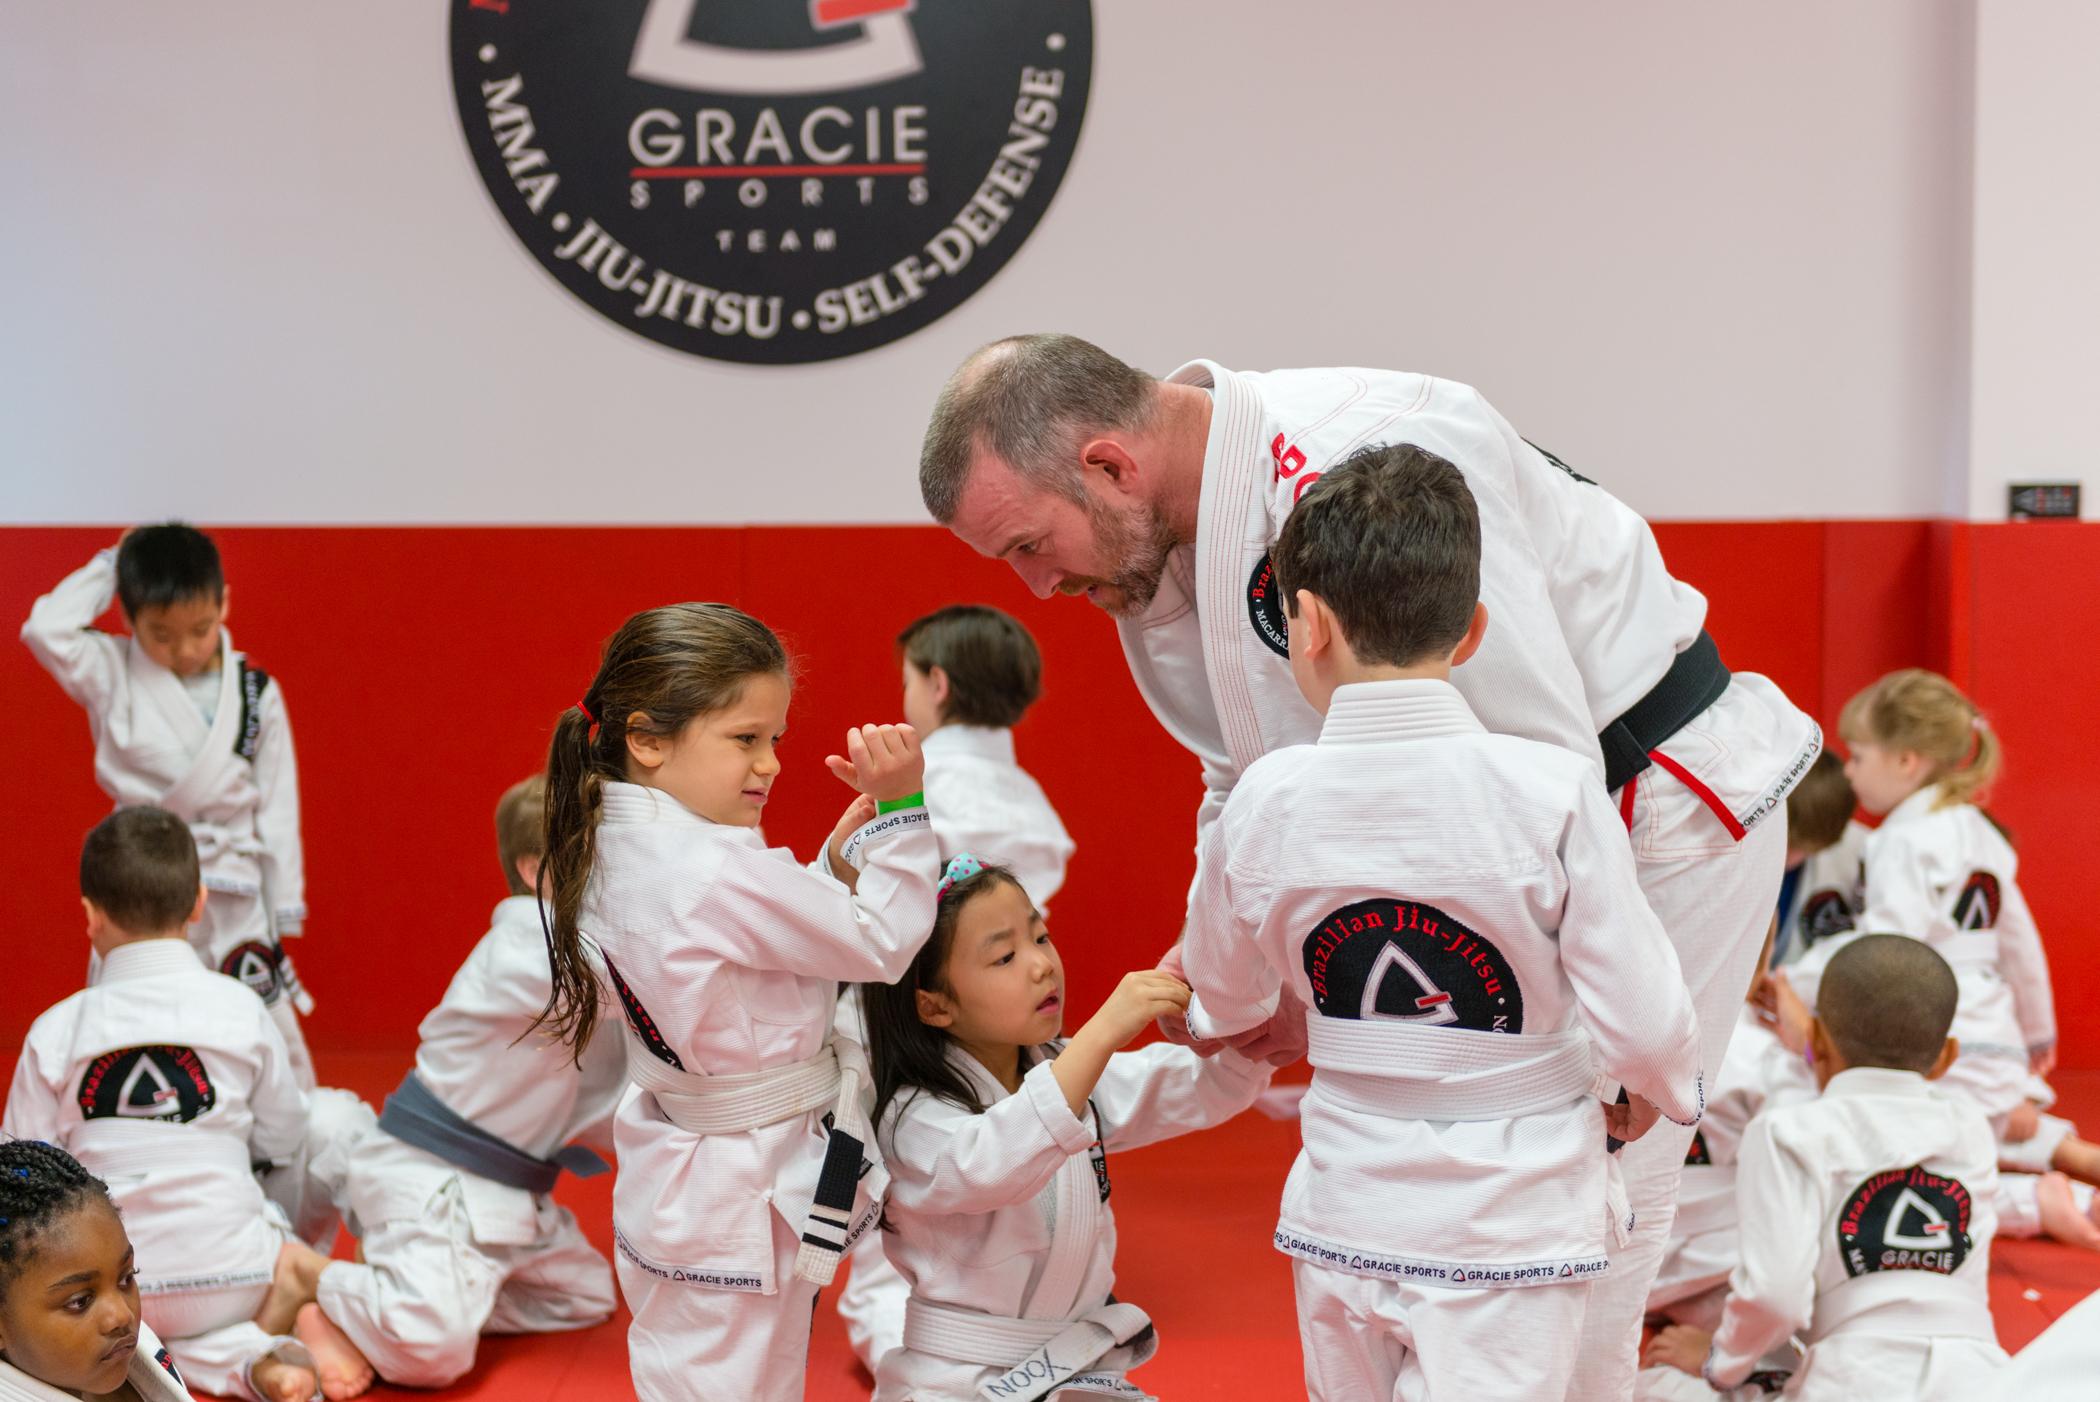 Gracie-Sports-Kids-7.jpg